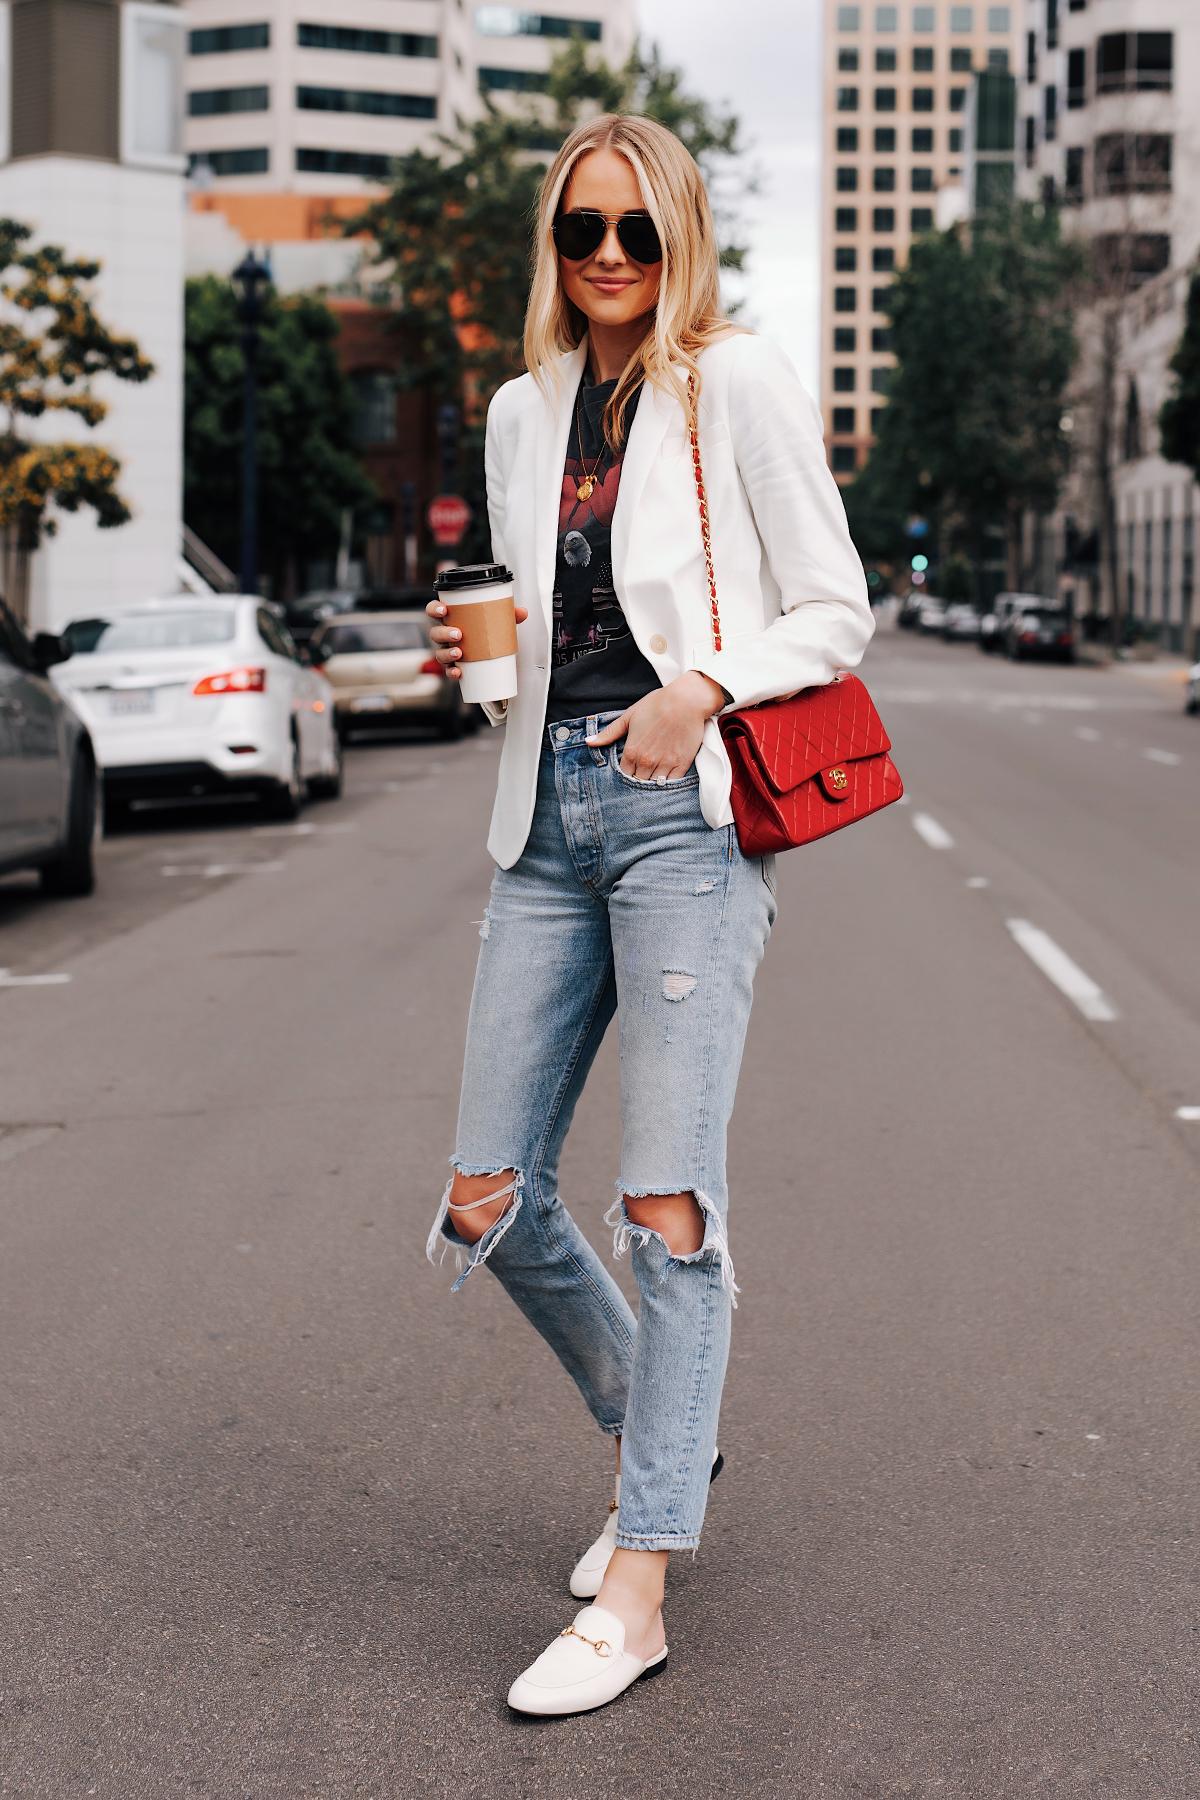 Blonde Woman Wearing White Blazer Anine Bing Graphic Tshirt Boyish Ripped Jeans Red Chanel Handbag Gucci Princetown White Mules Fashion Jackson San Diego Fashion Blogger Street Style